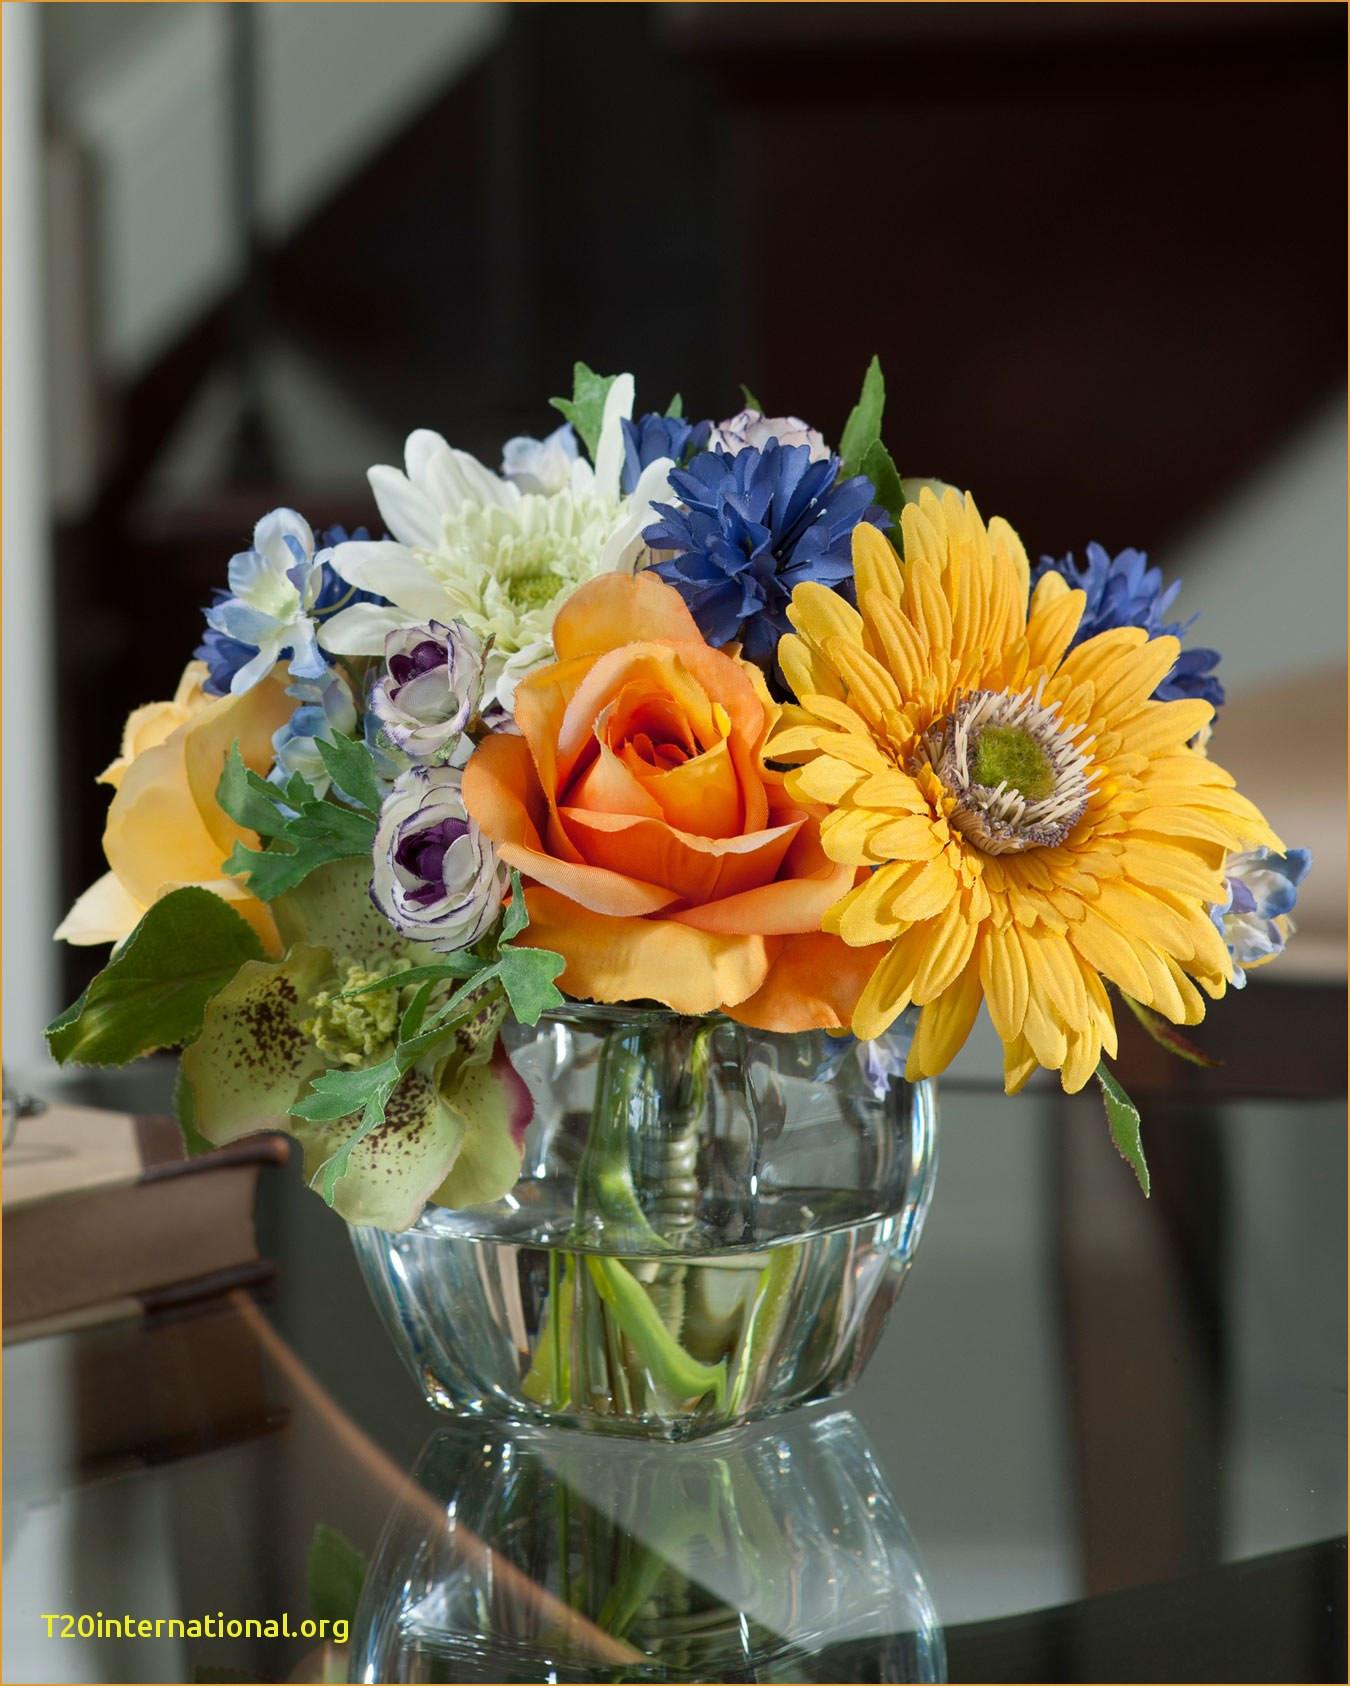 led flowers in vase of artificial flower decoration for home luxury artificial flower in artificial flower decoration for home luxury artificial flower arrangements in glass vases